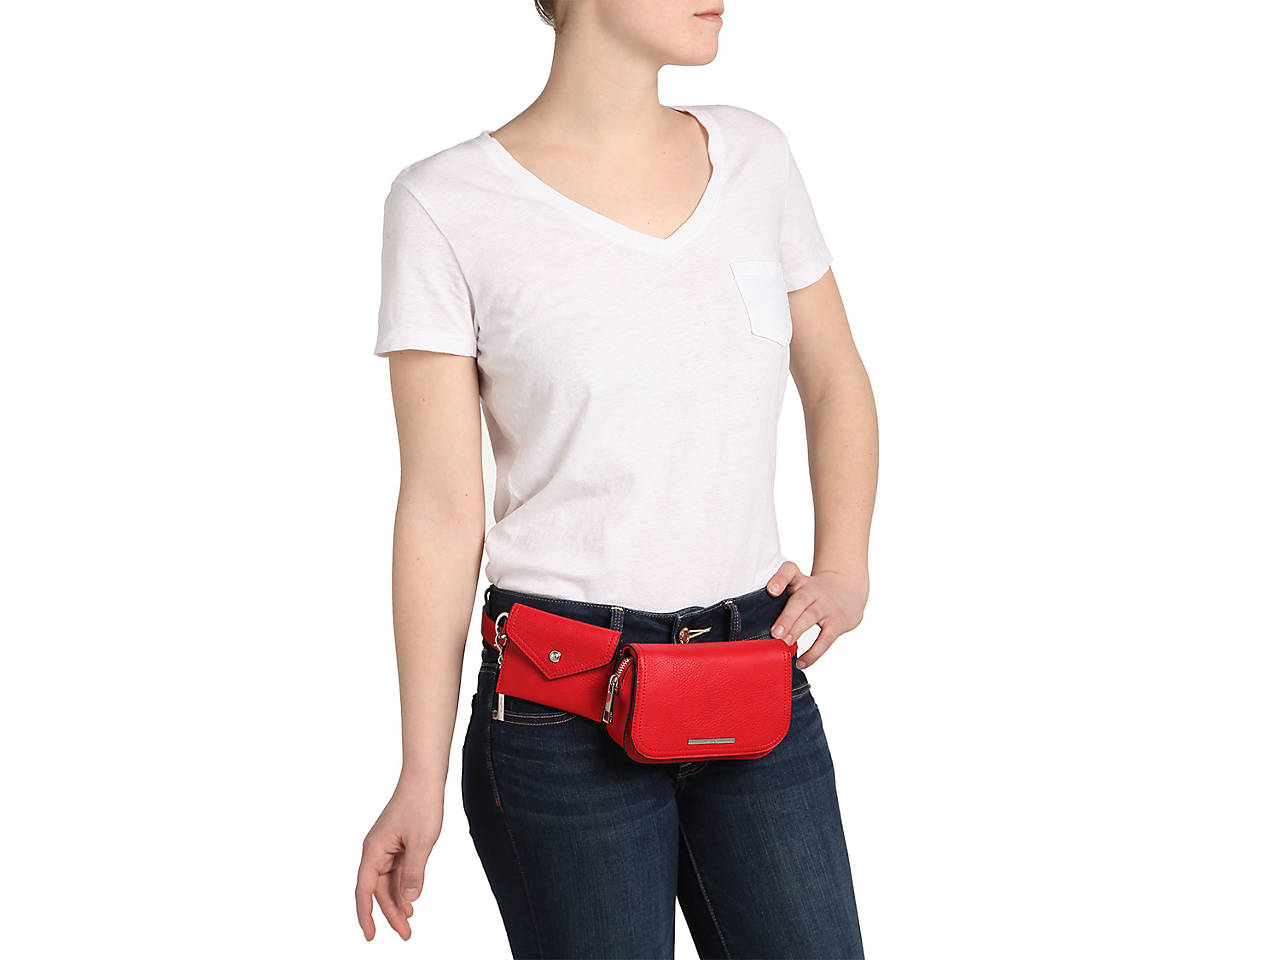 9713a02ba64f3 Gumilu Belt Bag